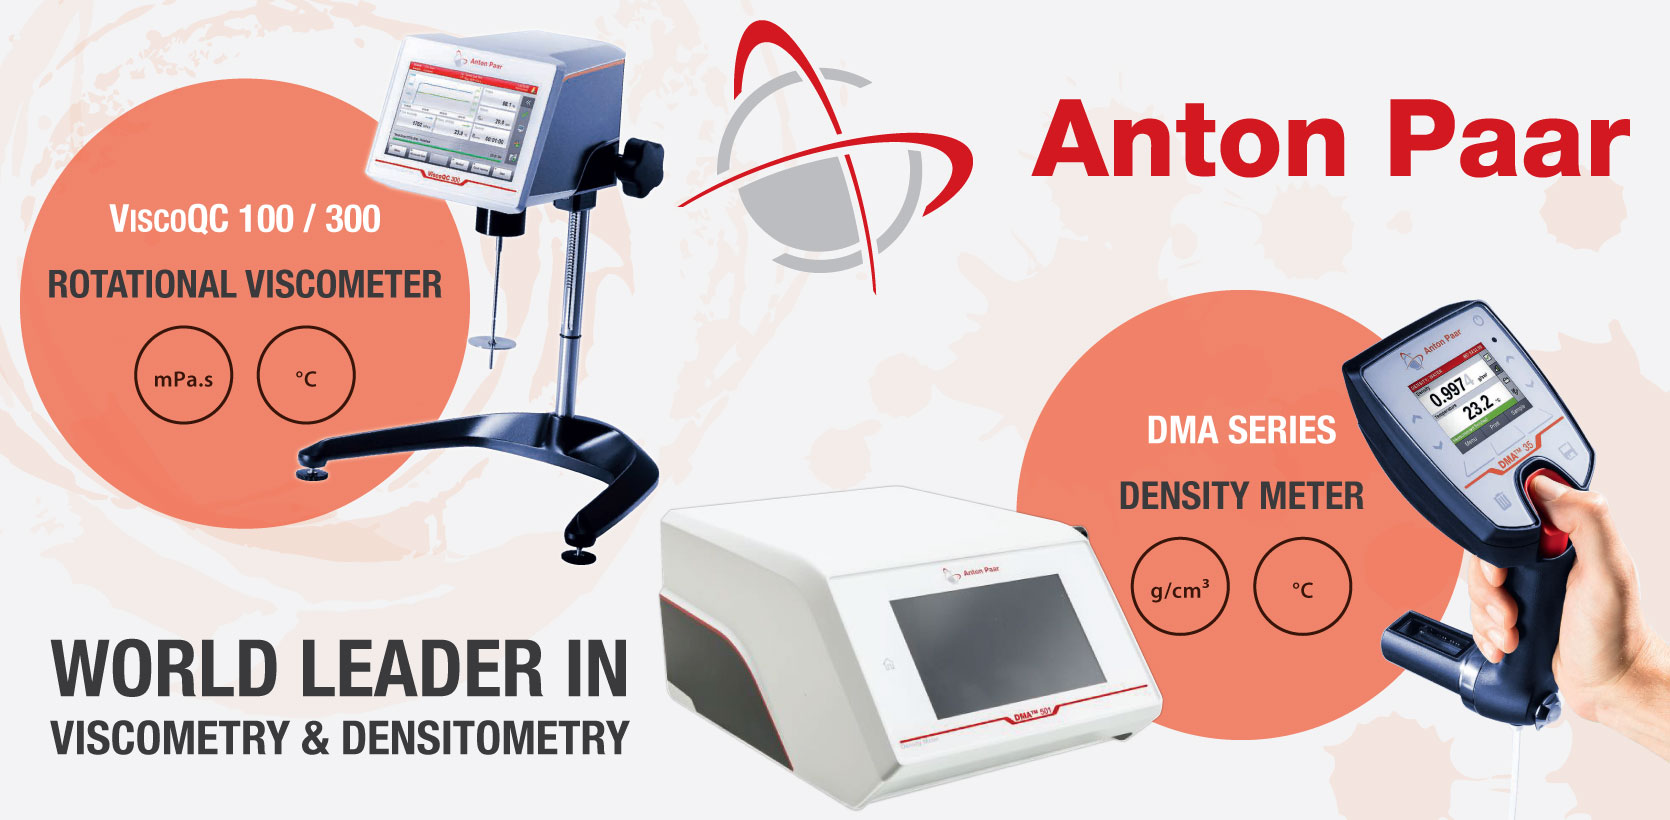 Muser Anton Paar Authorized Malaysia Distributor